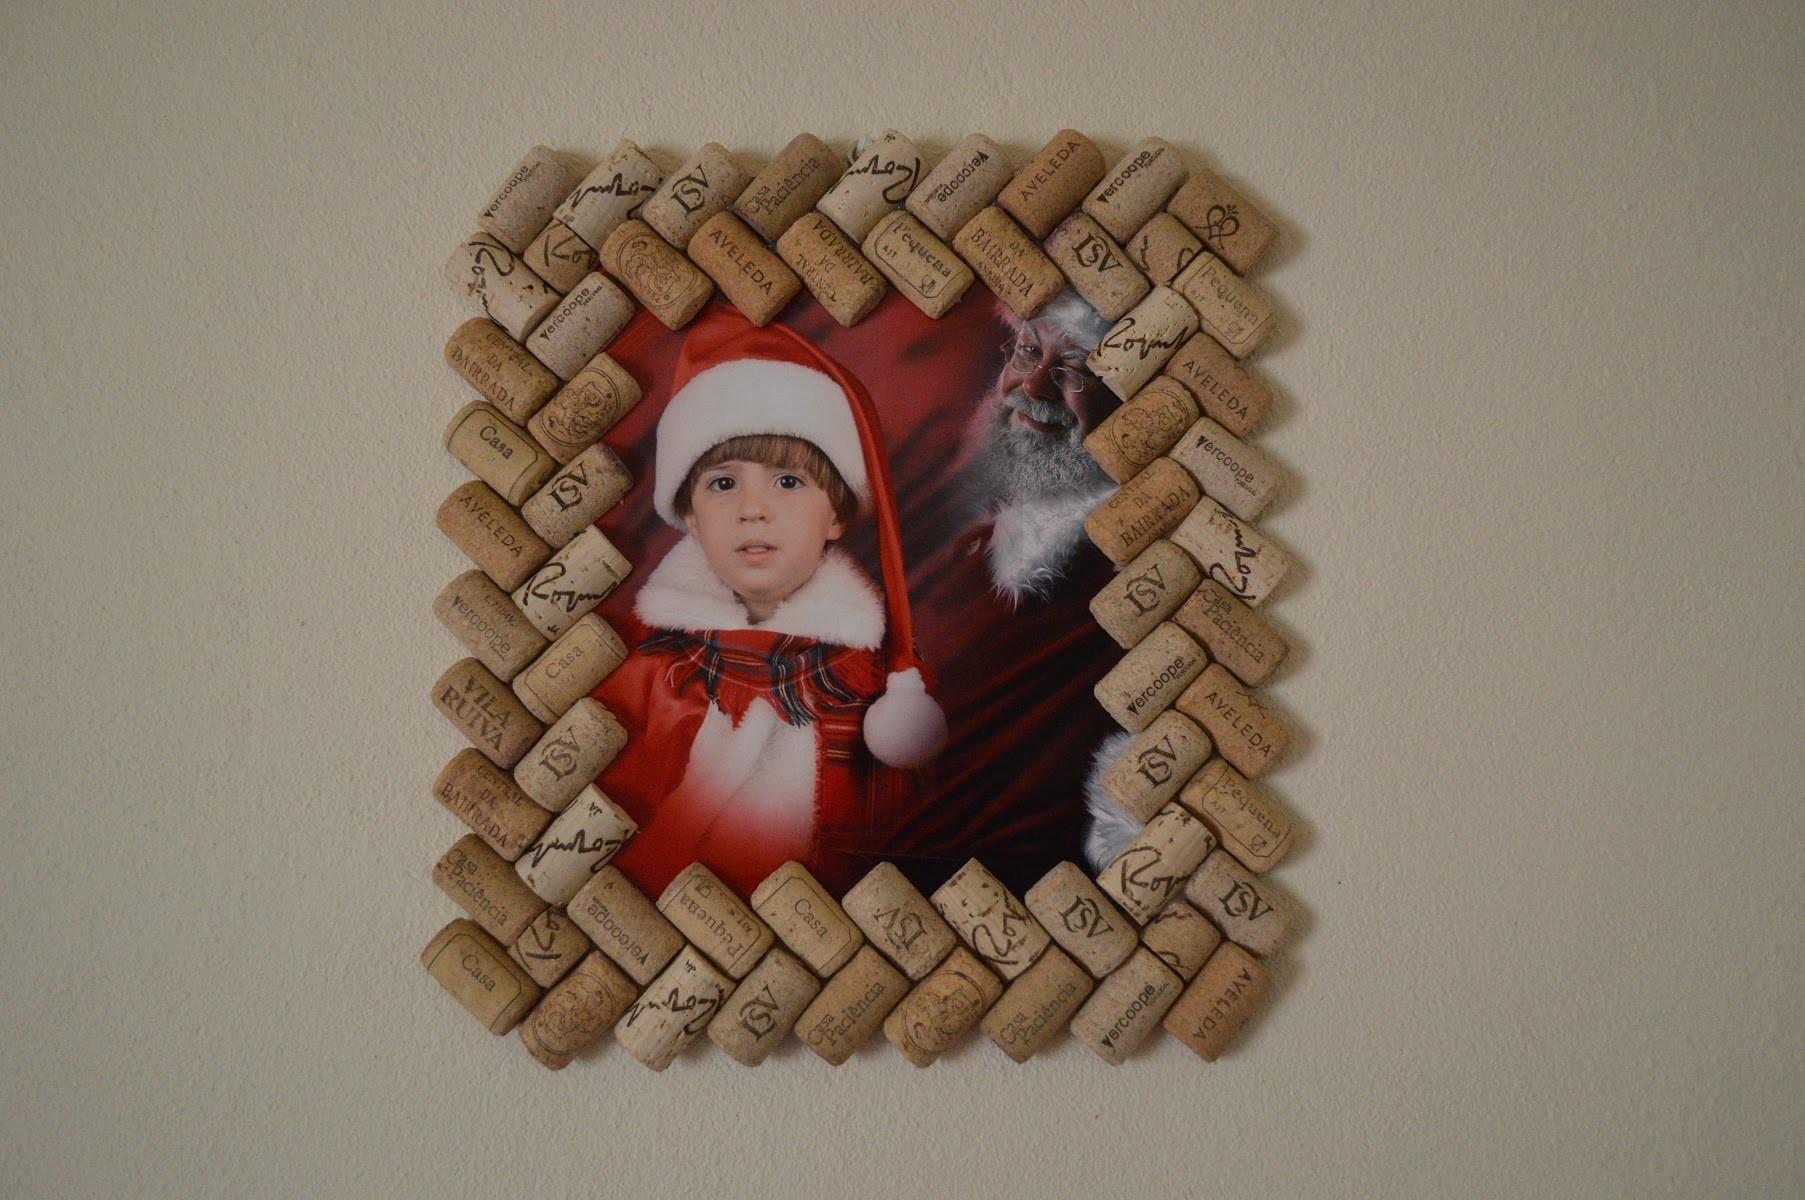 Como hacer Porta retrato con tapones de corcho - How to make Photo Frame with corks